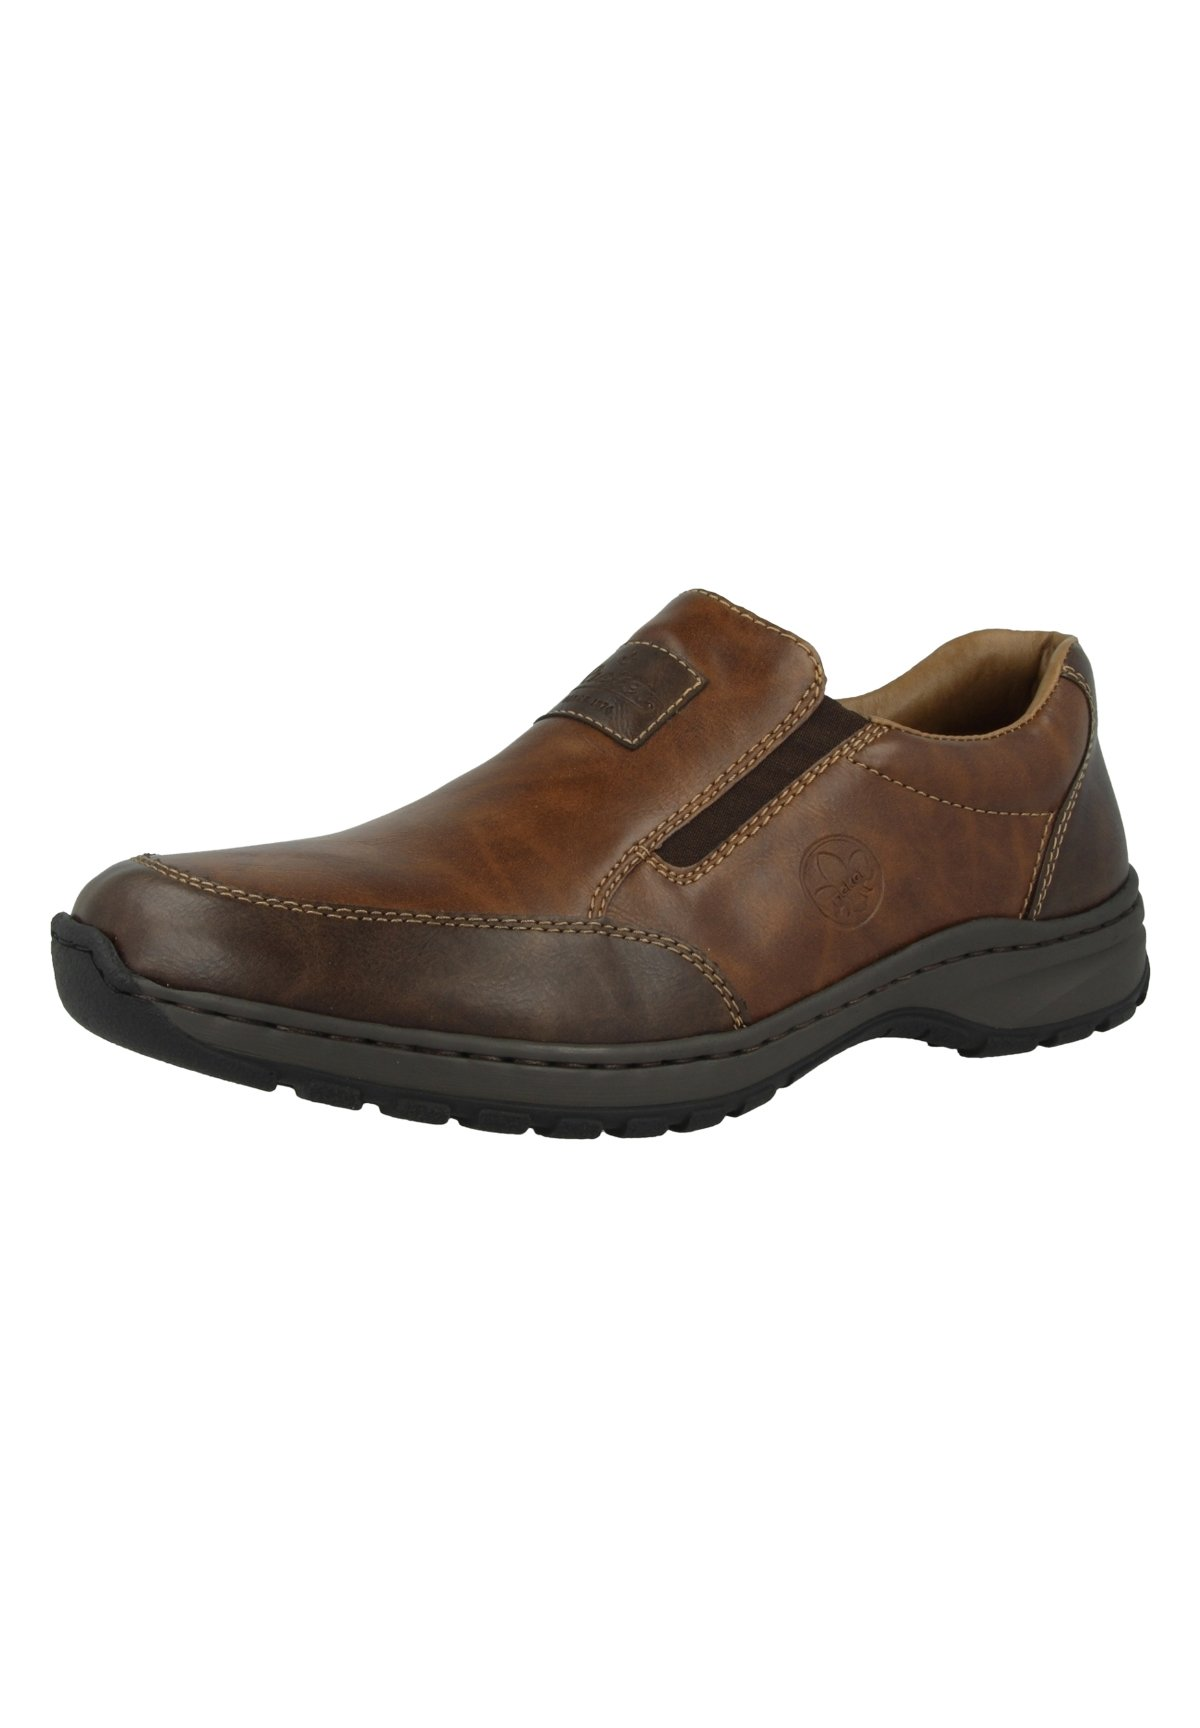 Rieker Slip-ins - brown/brun - Herrskor 4Qvke